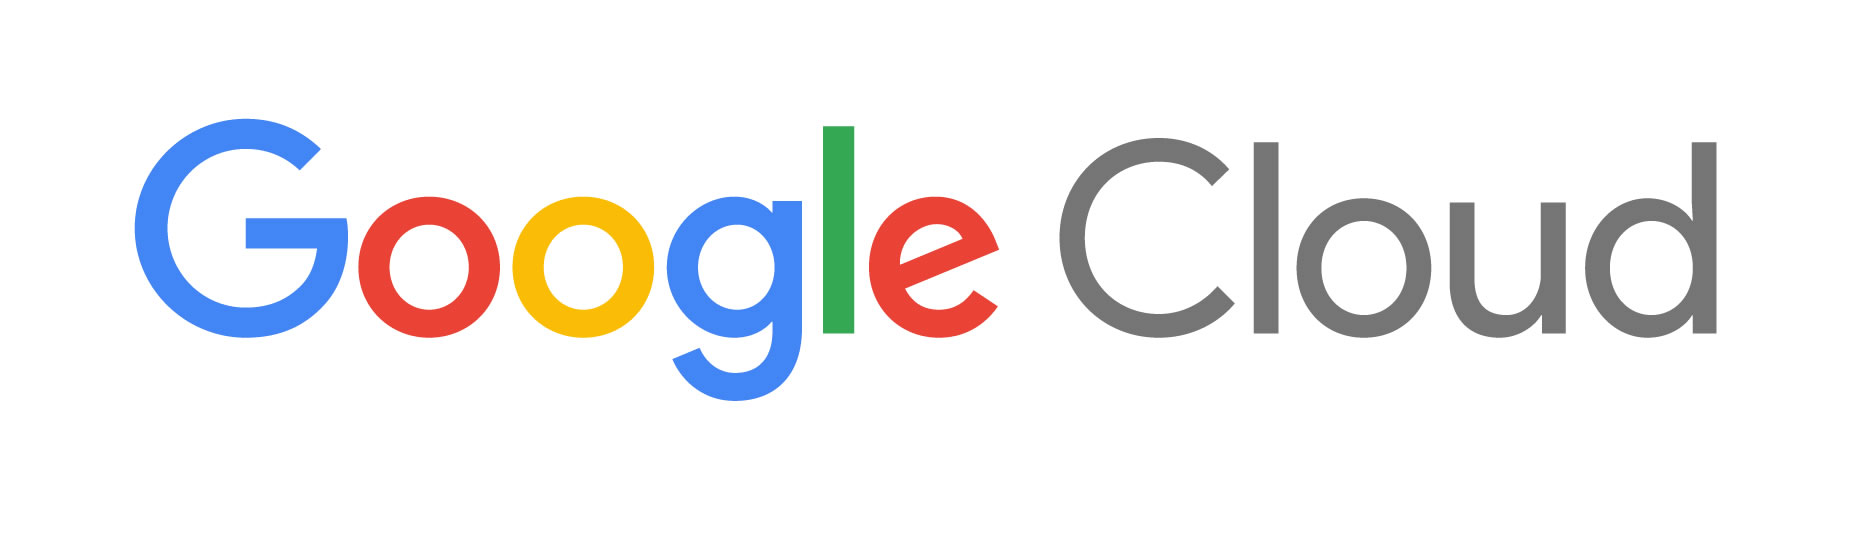 Google-Cloud-logo-color-png.jpg